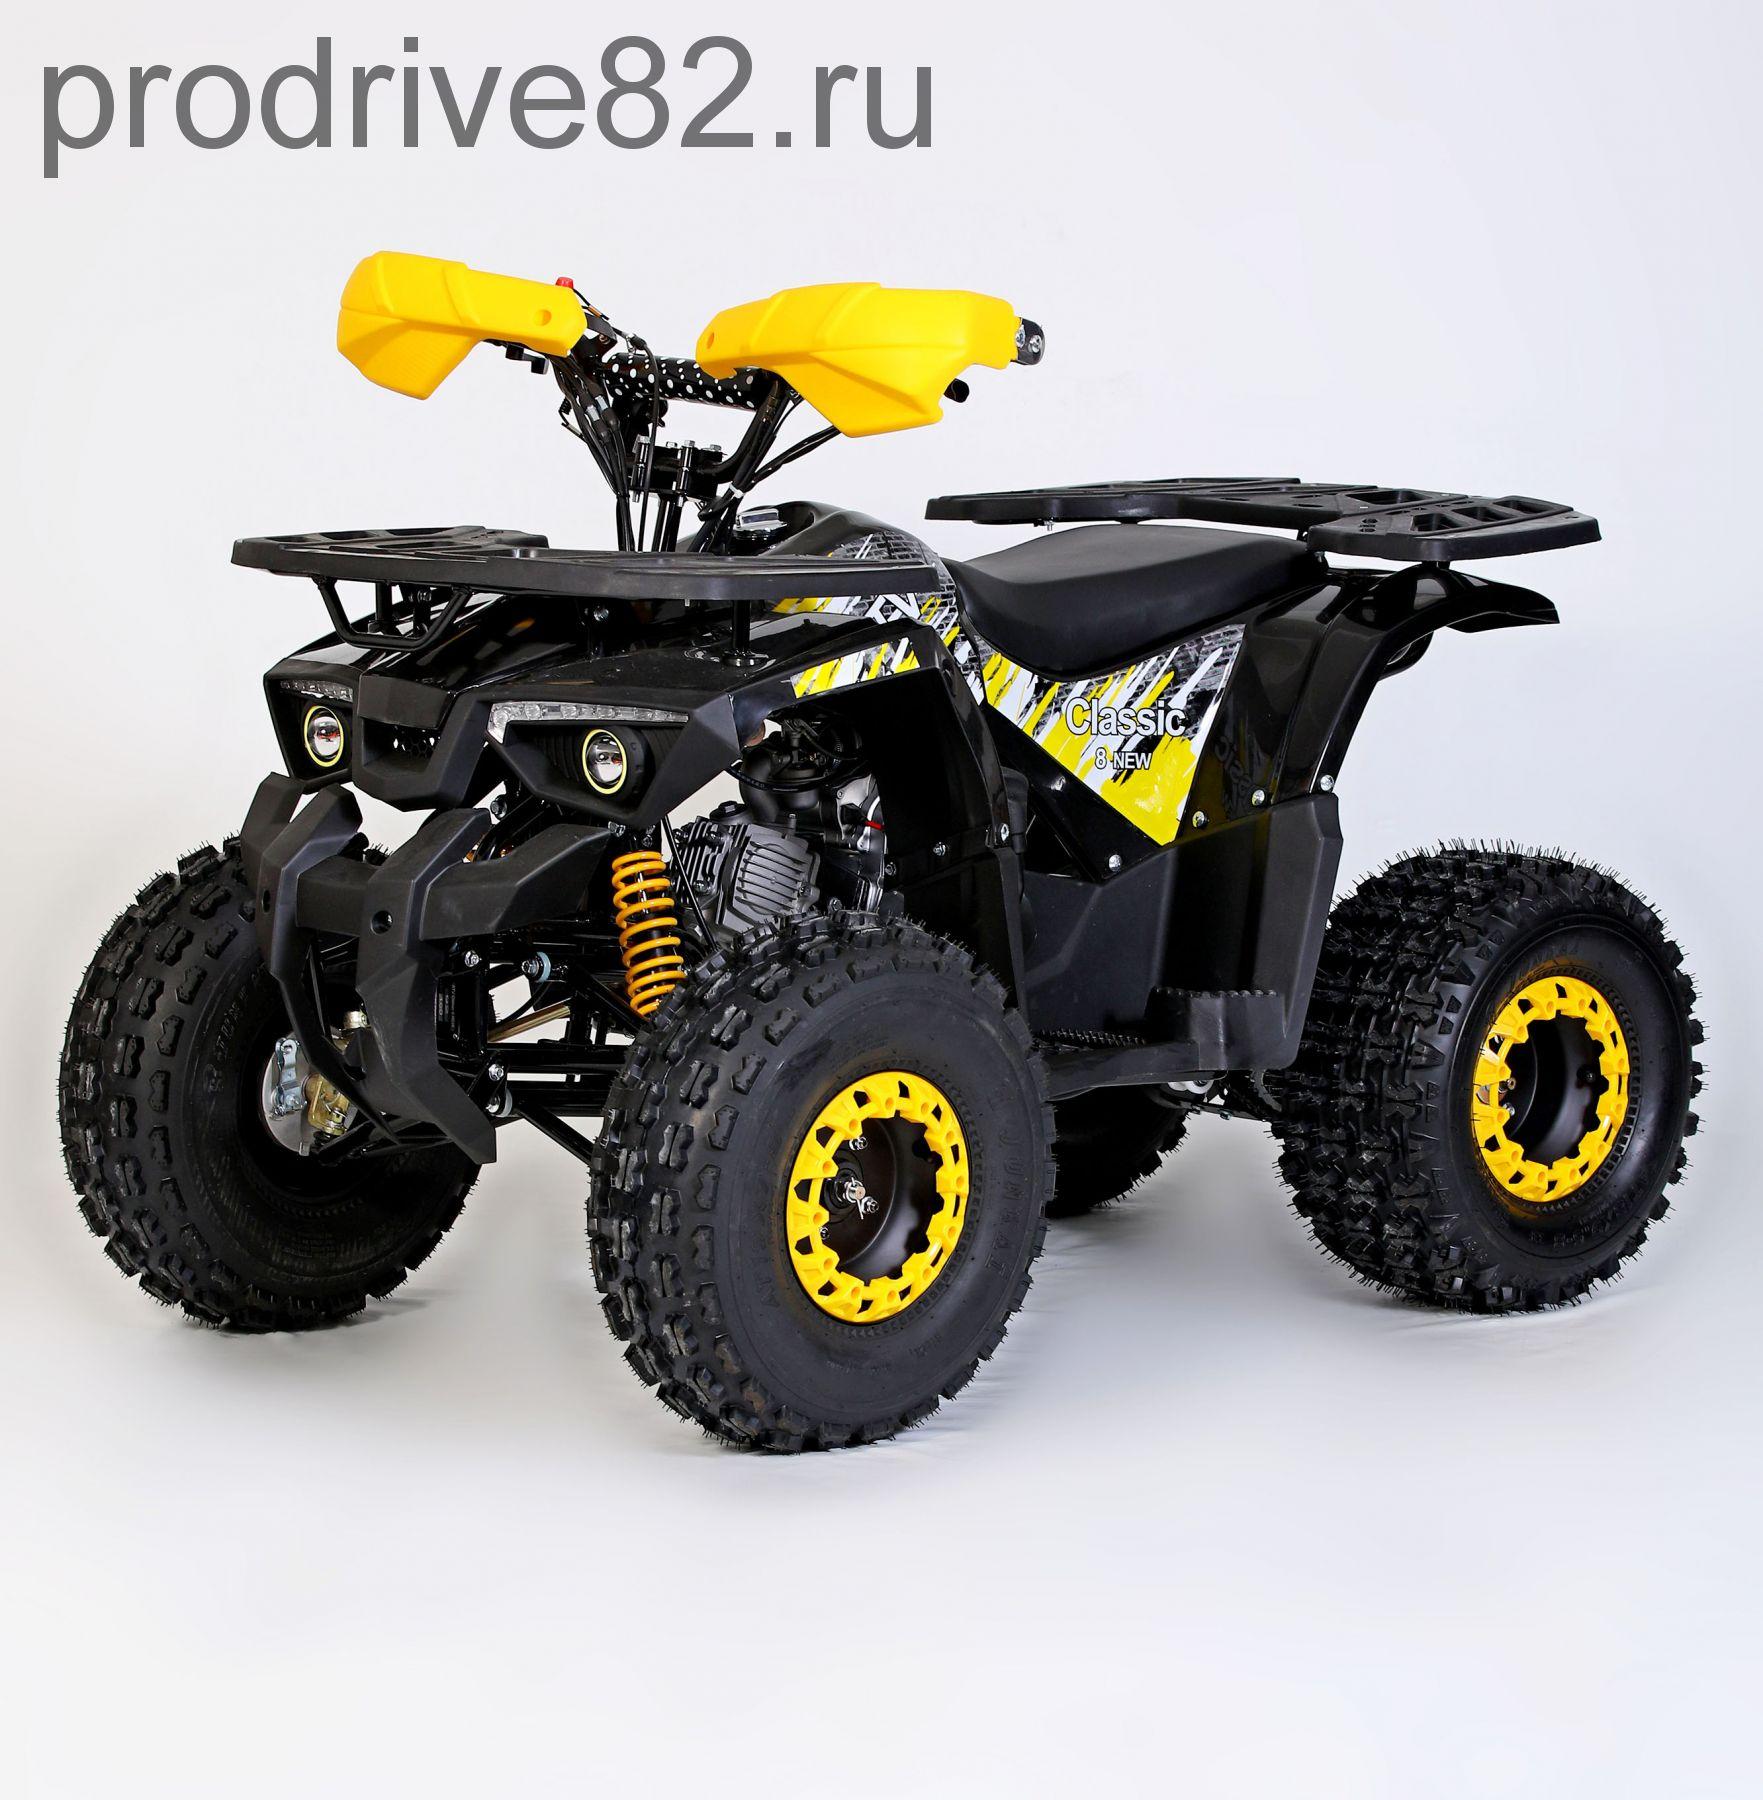 Avantis Classic 8 125 New сс Квадроцикл бензиновый